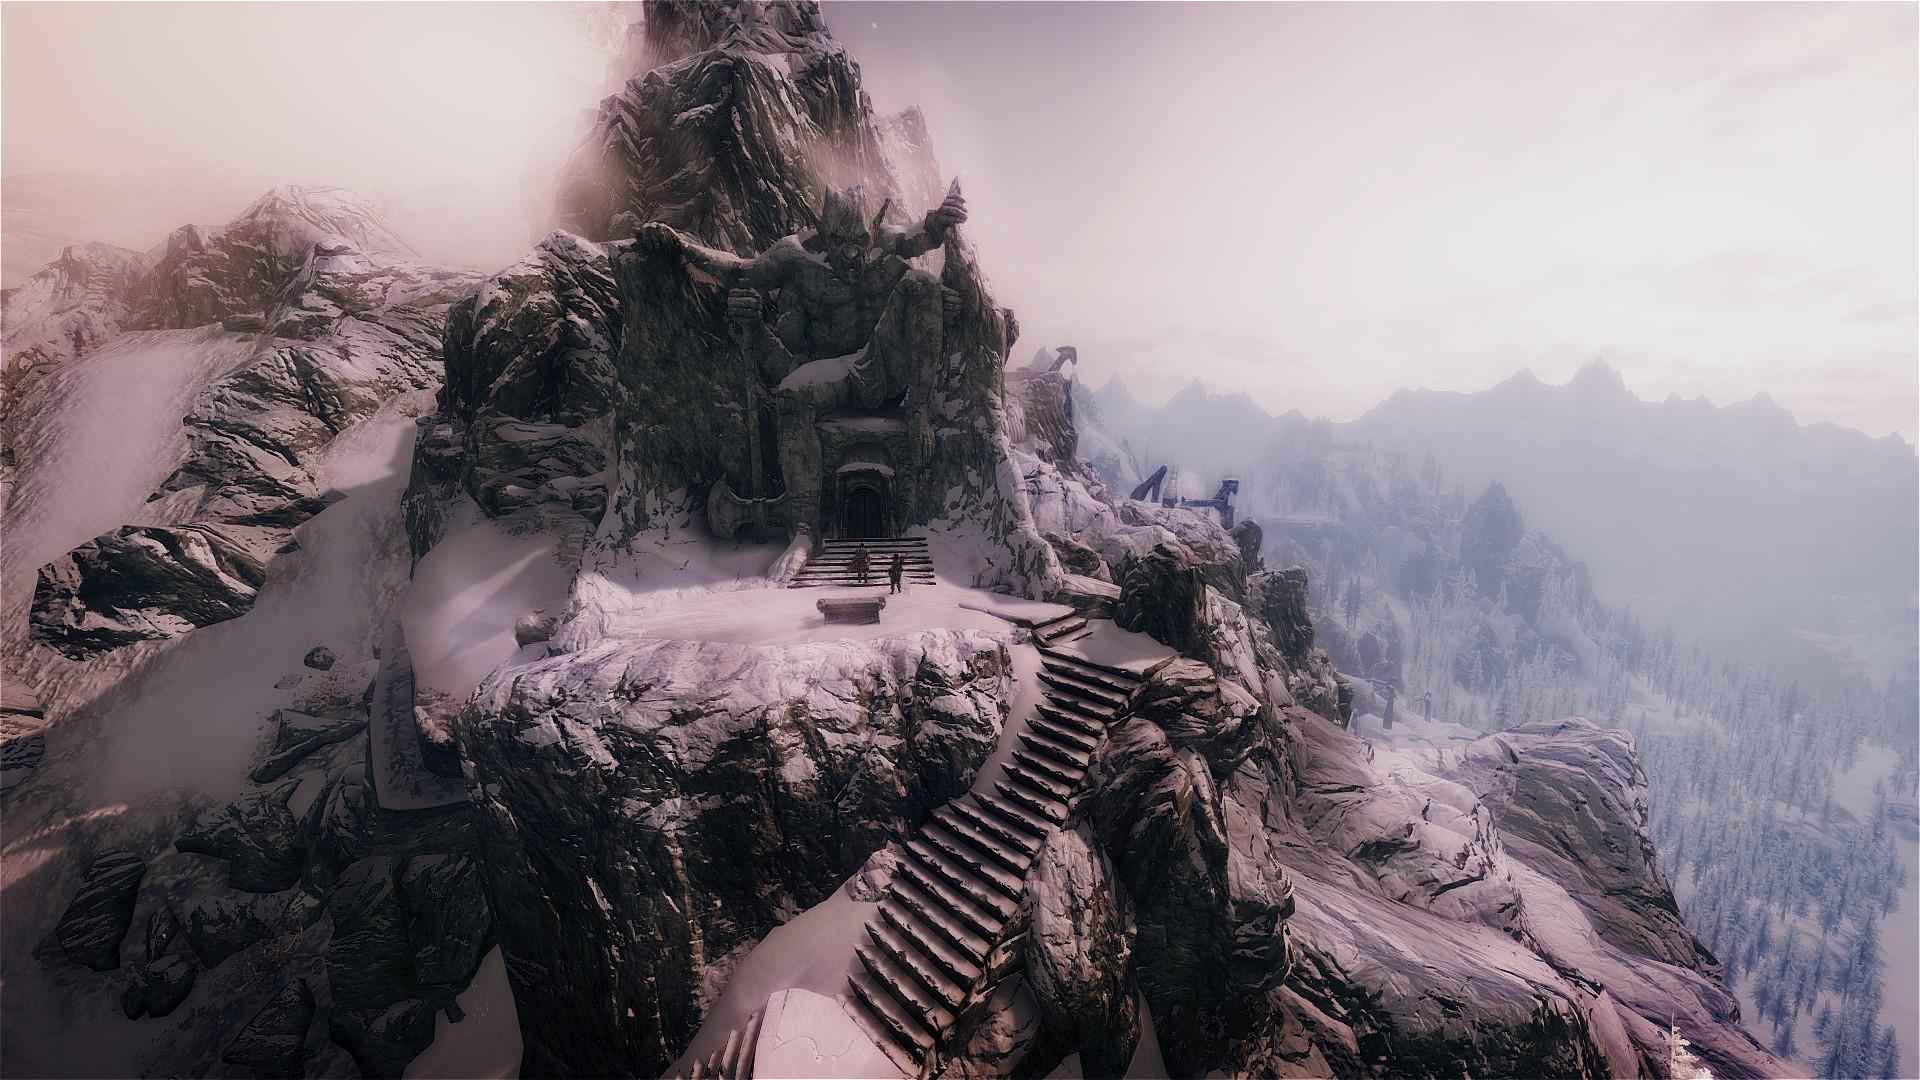 The Elder Scrolls V : Skyrim ! The_shrine_of_mehrunes_dagon_by_lupusmagus-d4lzqjx